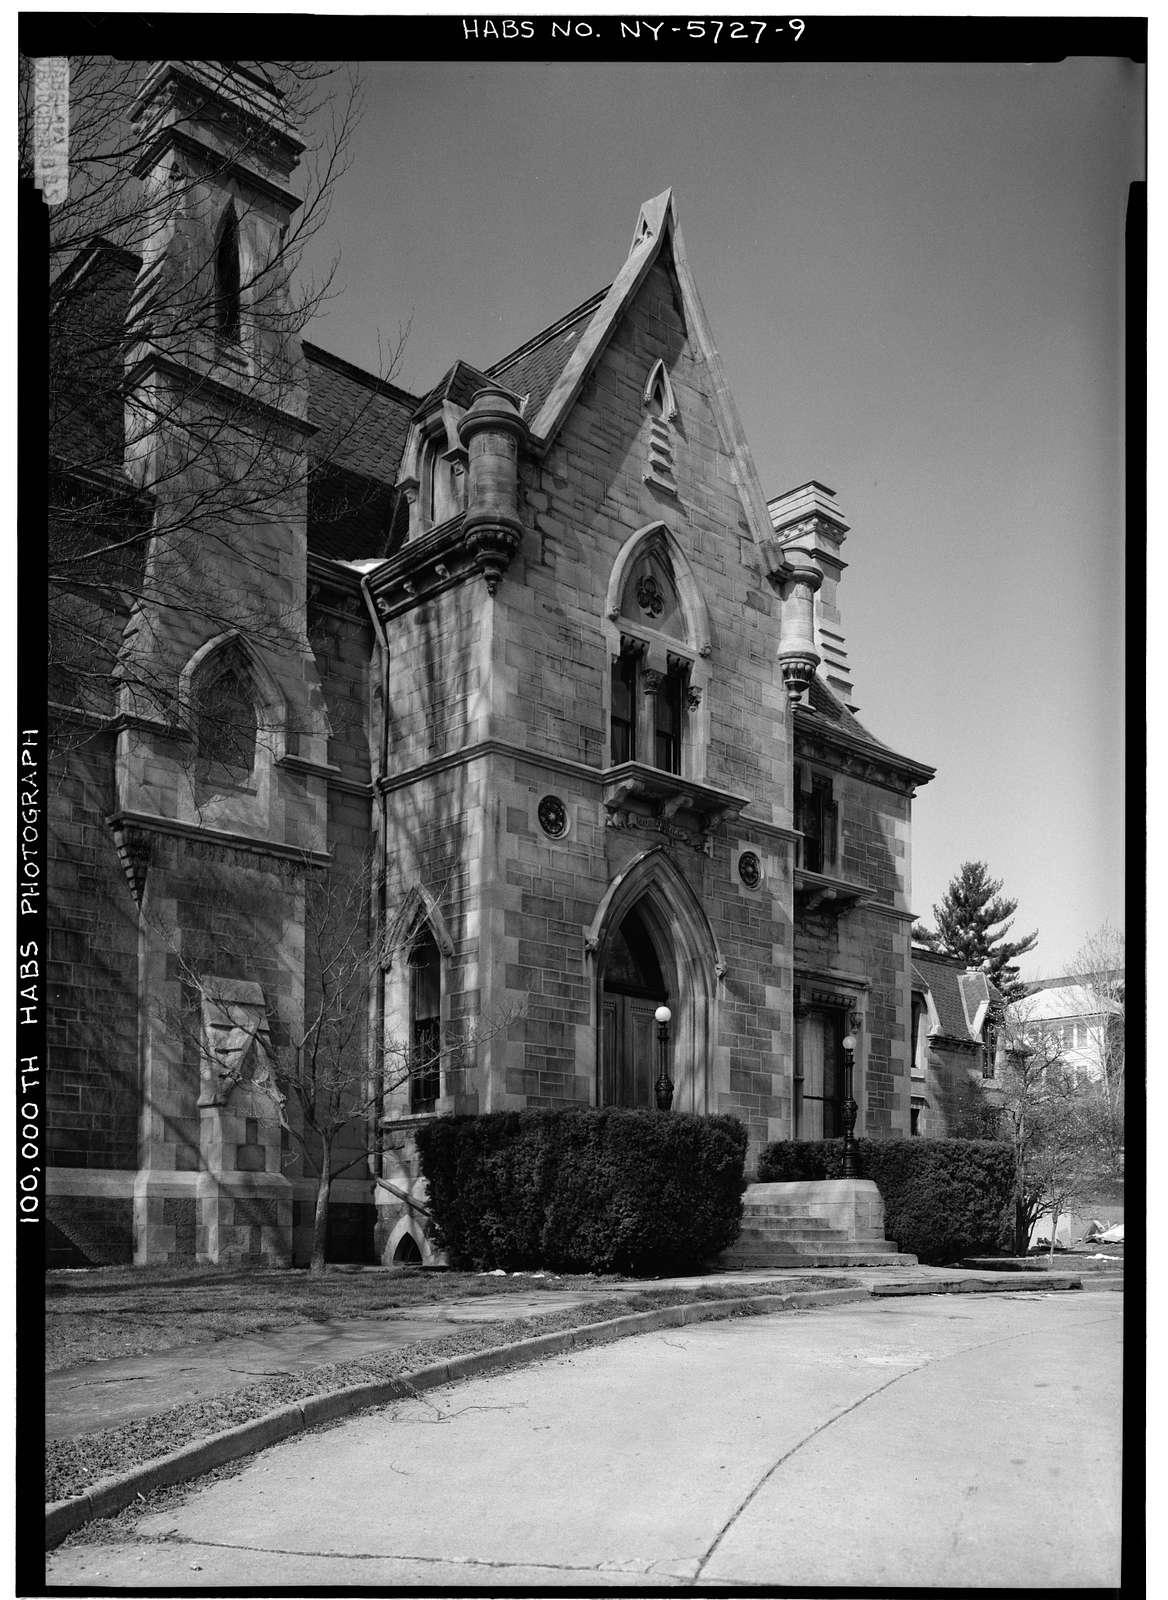 Cornell University, Llenroc, 100 Cornell Avenue, Ithaca, Tompkins County, NY